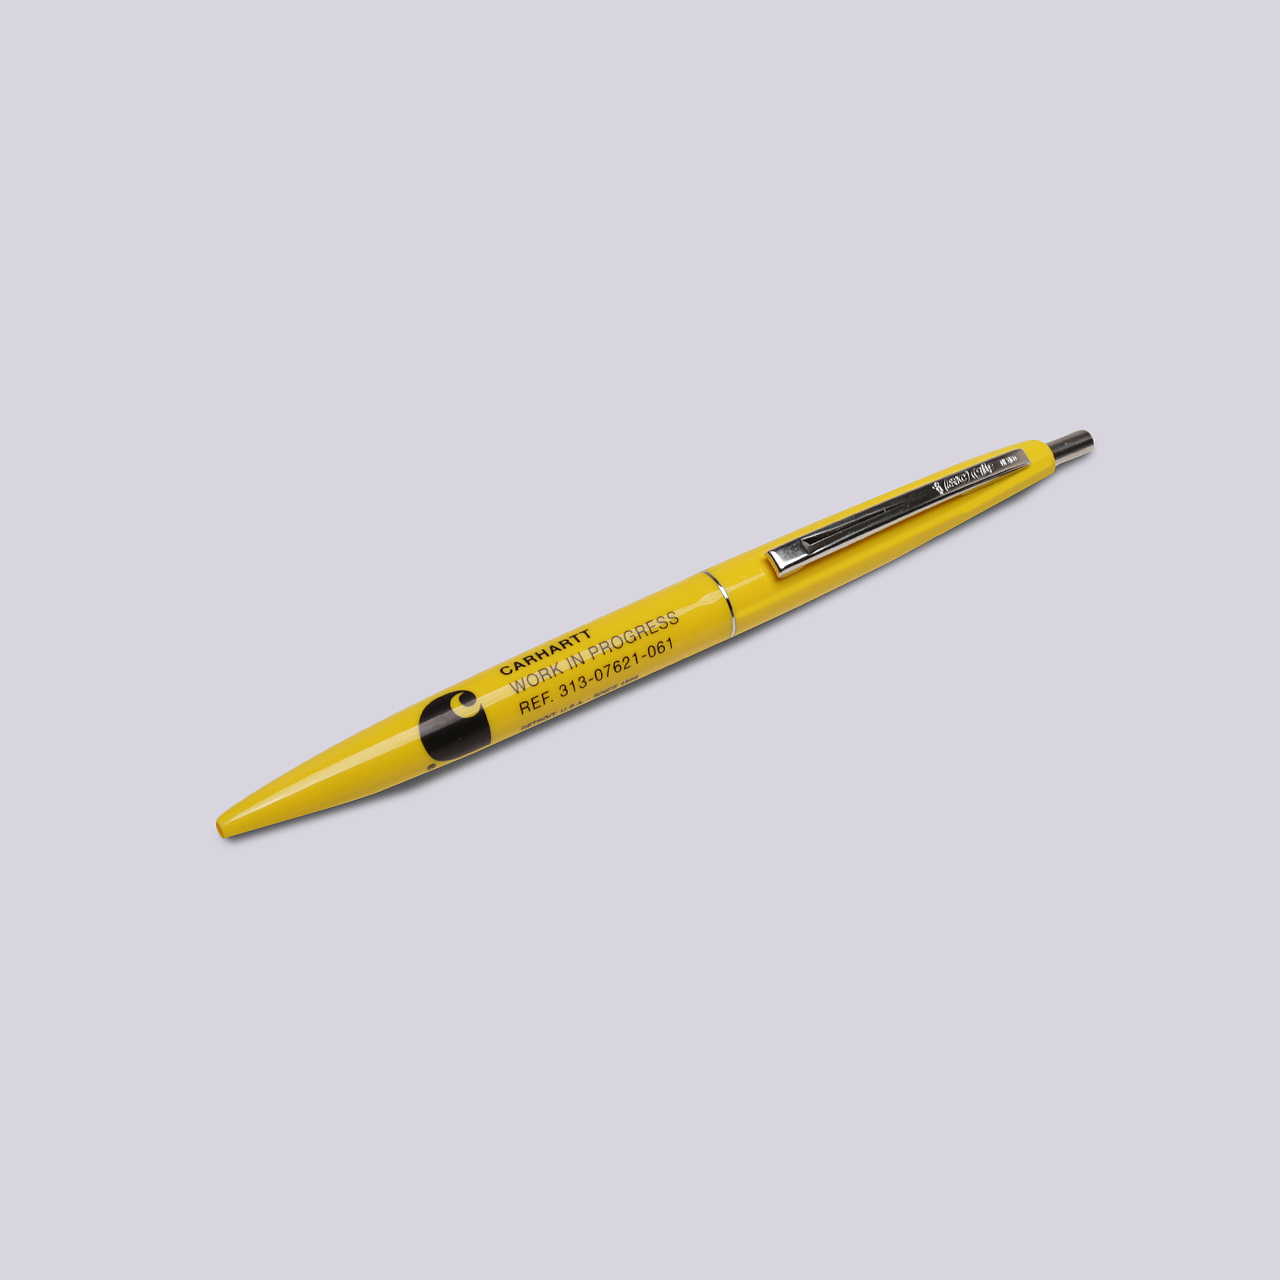 Шариковая ручка Carhartt WIP Work In Progress